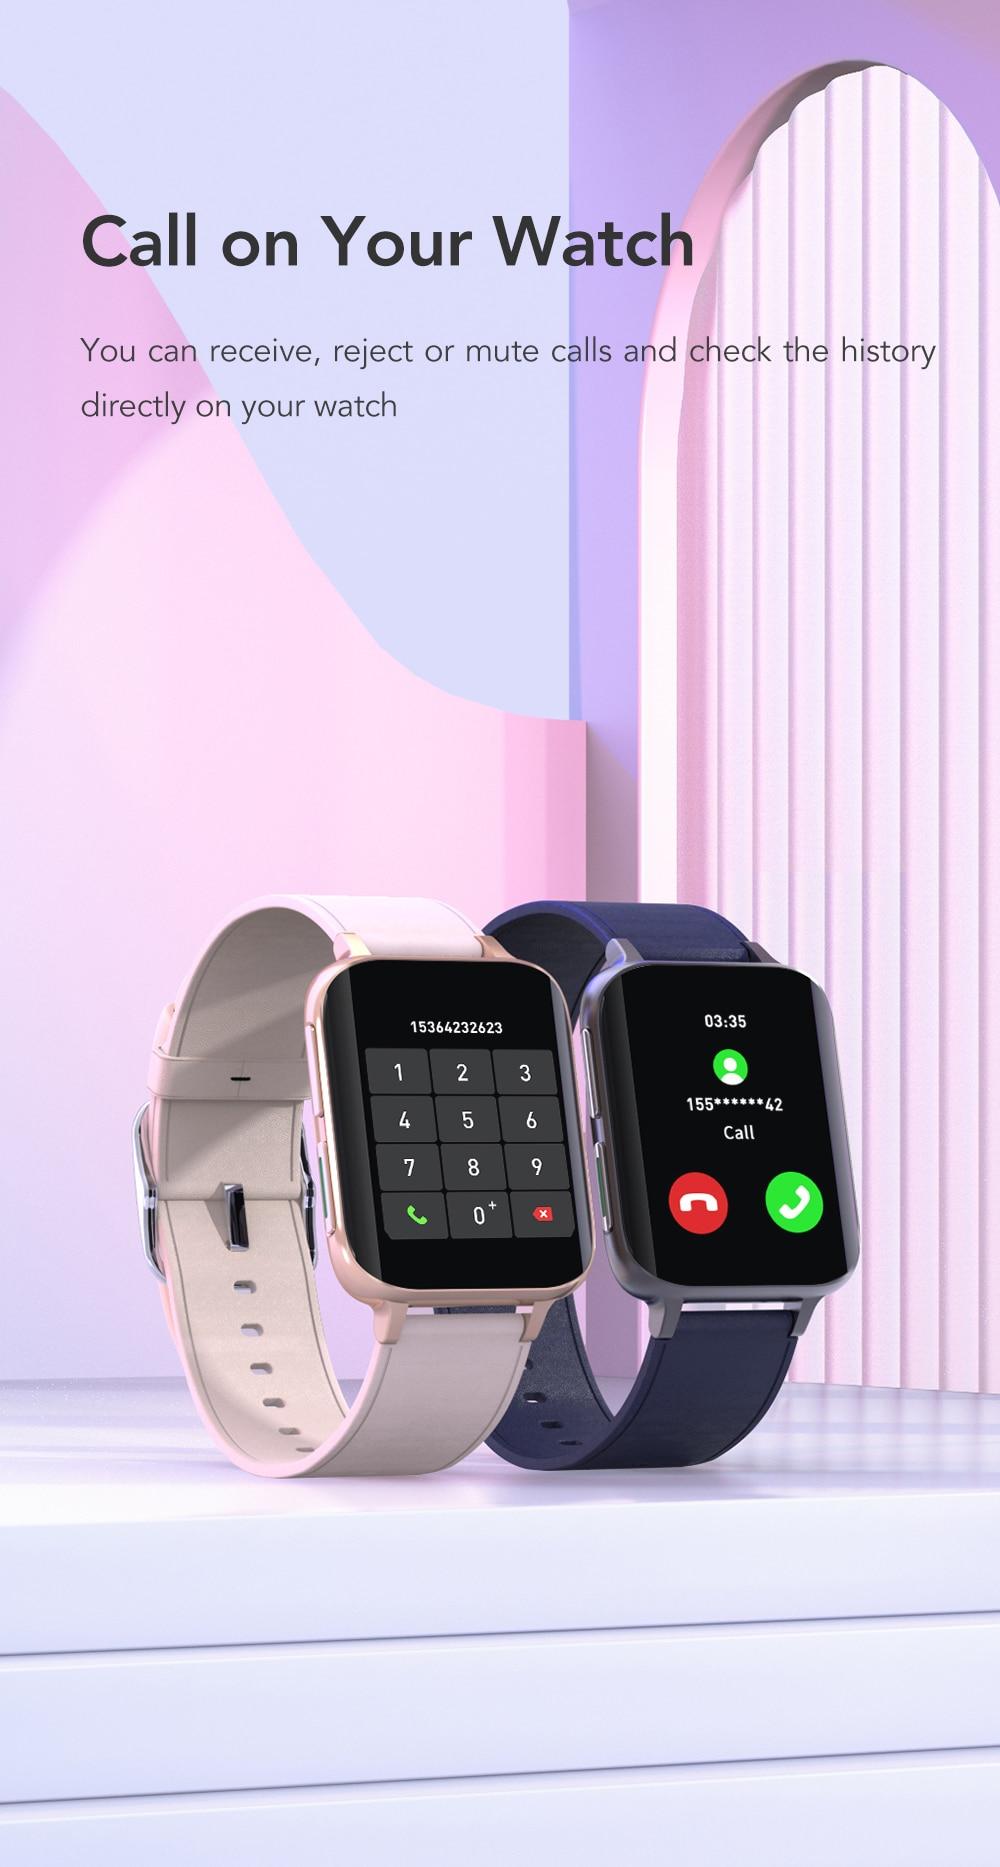 H6cc238911ca34c8da56c0da5cd97fee7n SANLEPUS 2021 NEW Dial Calls Smart Watch Men Women Waterproof Smartwatch MP3 Player For OPPO Android Apple Xiaomi Huawei